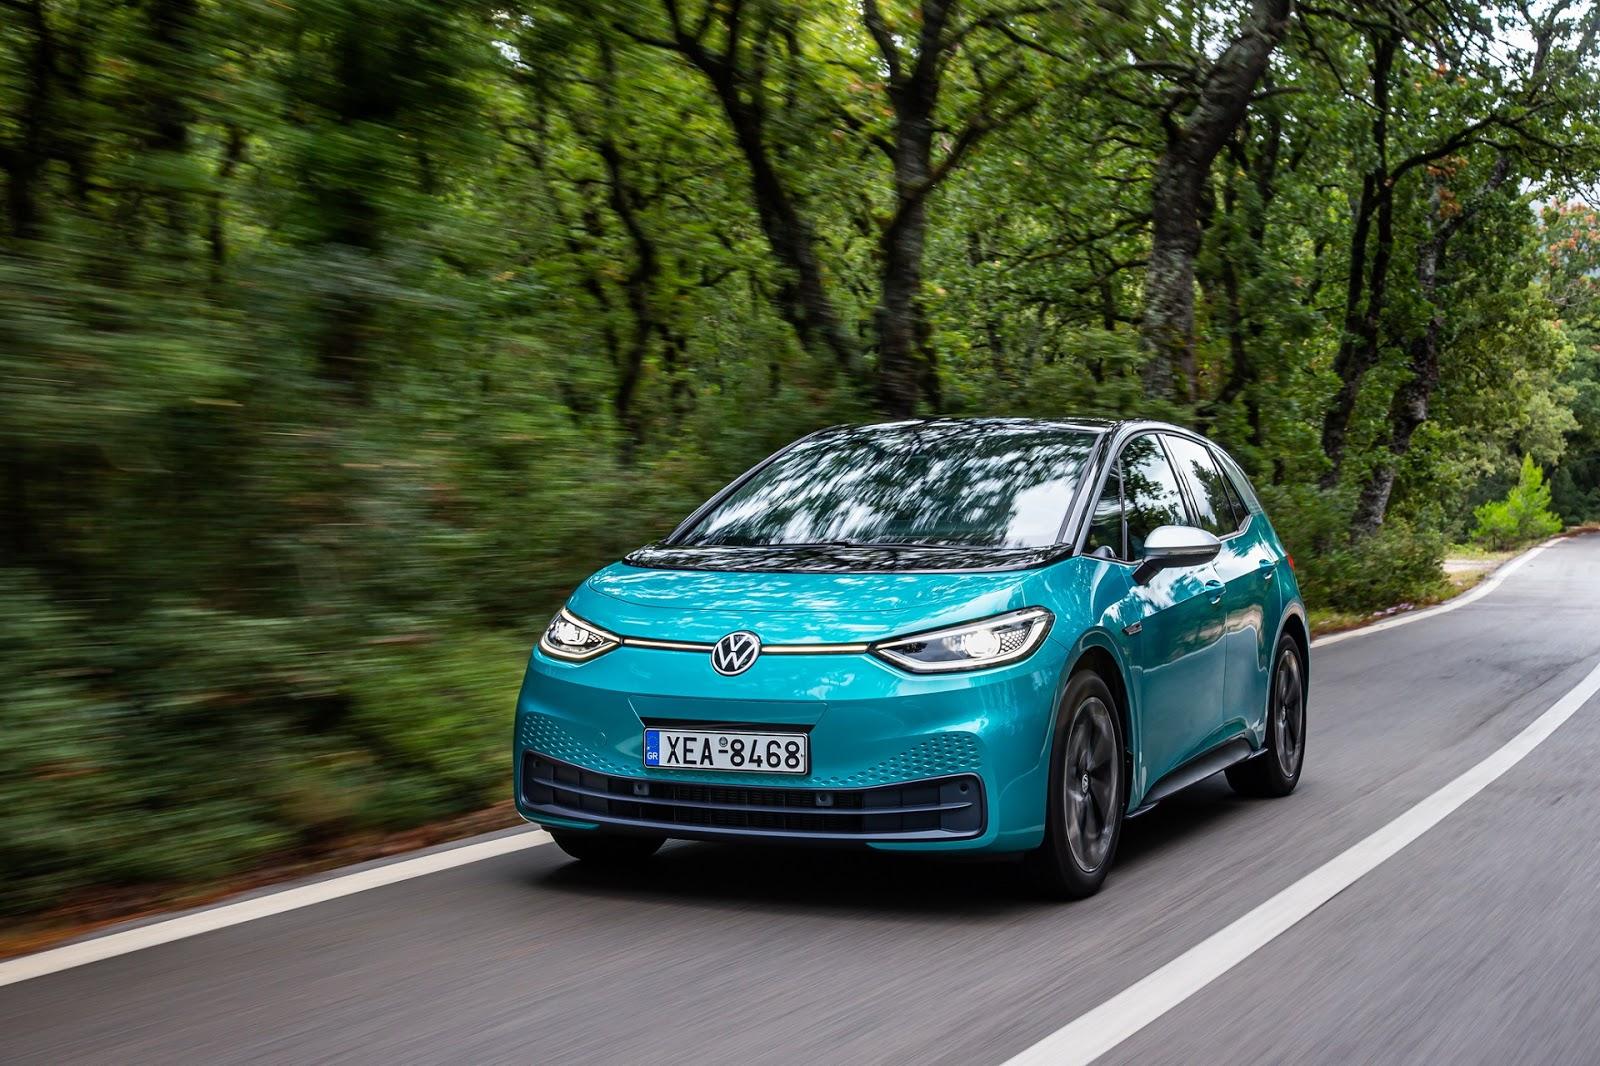 ID.3 Το Volkswagen Group μειώνει σημαντικά τον μέσο όρο ρύπων CO2 του Volkswagen Group, ειδήσεις